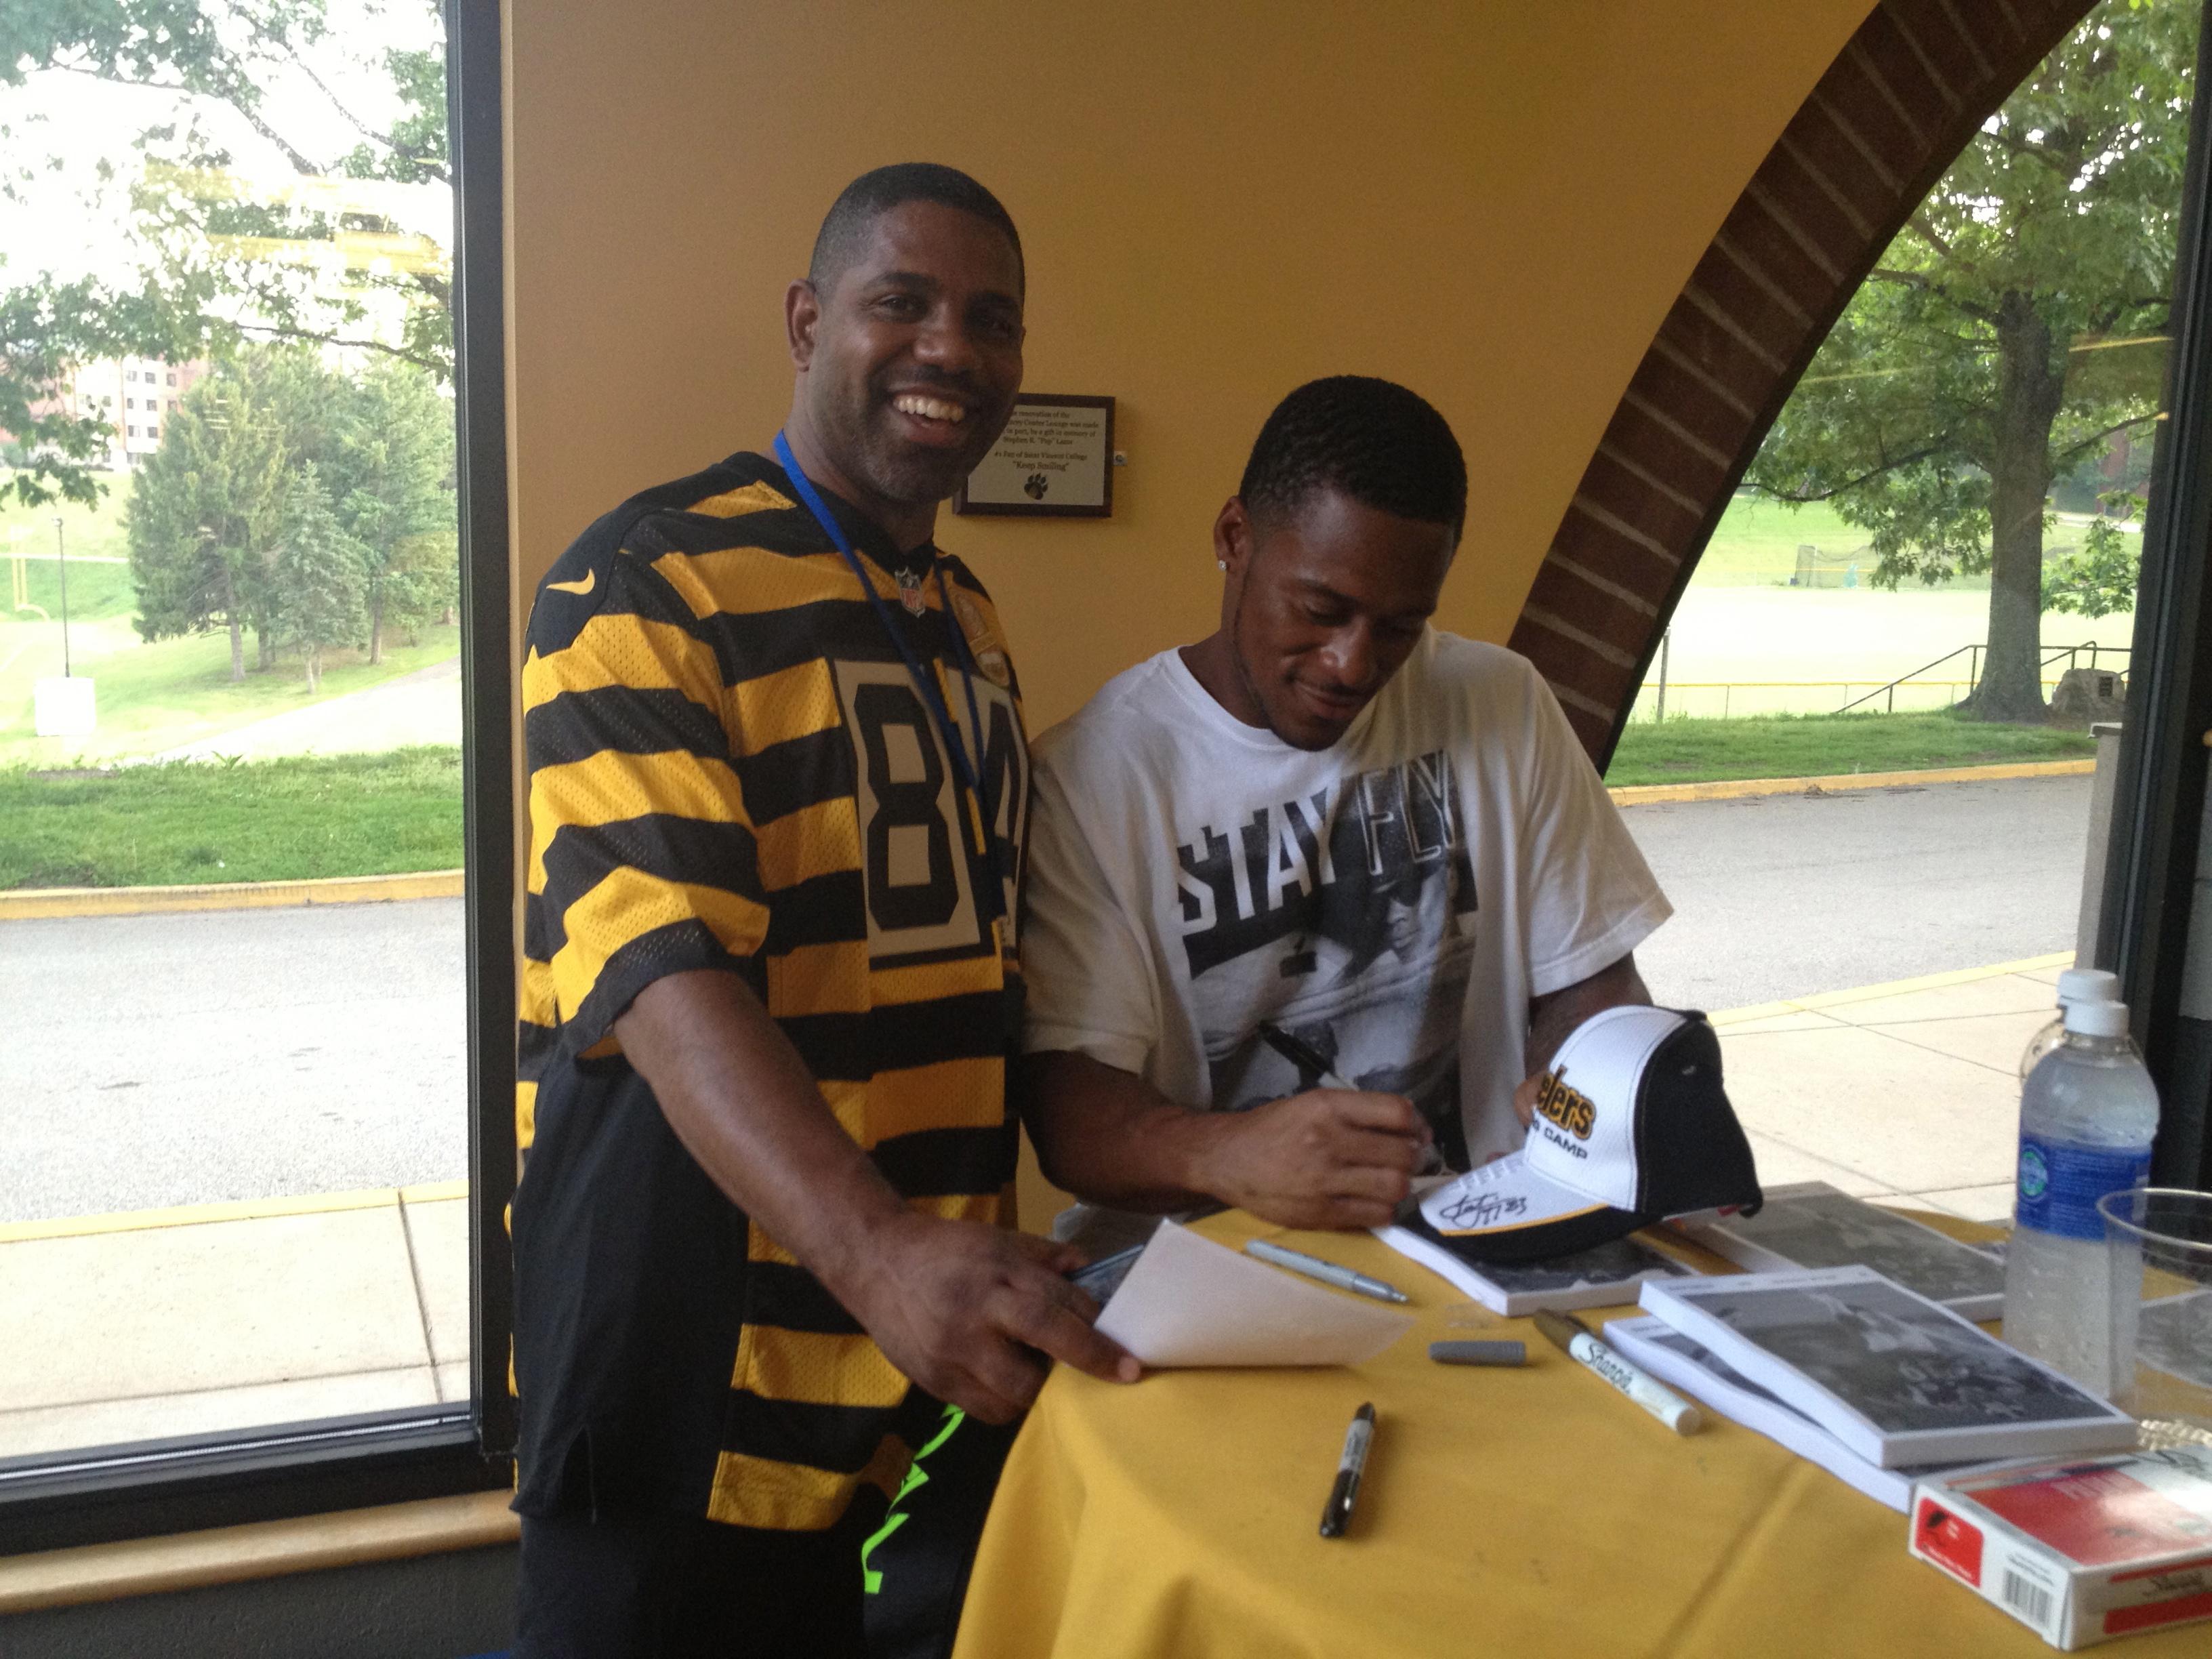 Willie Porter signs autographs